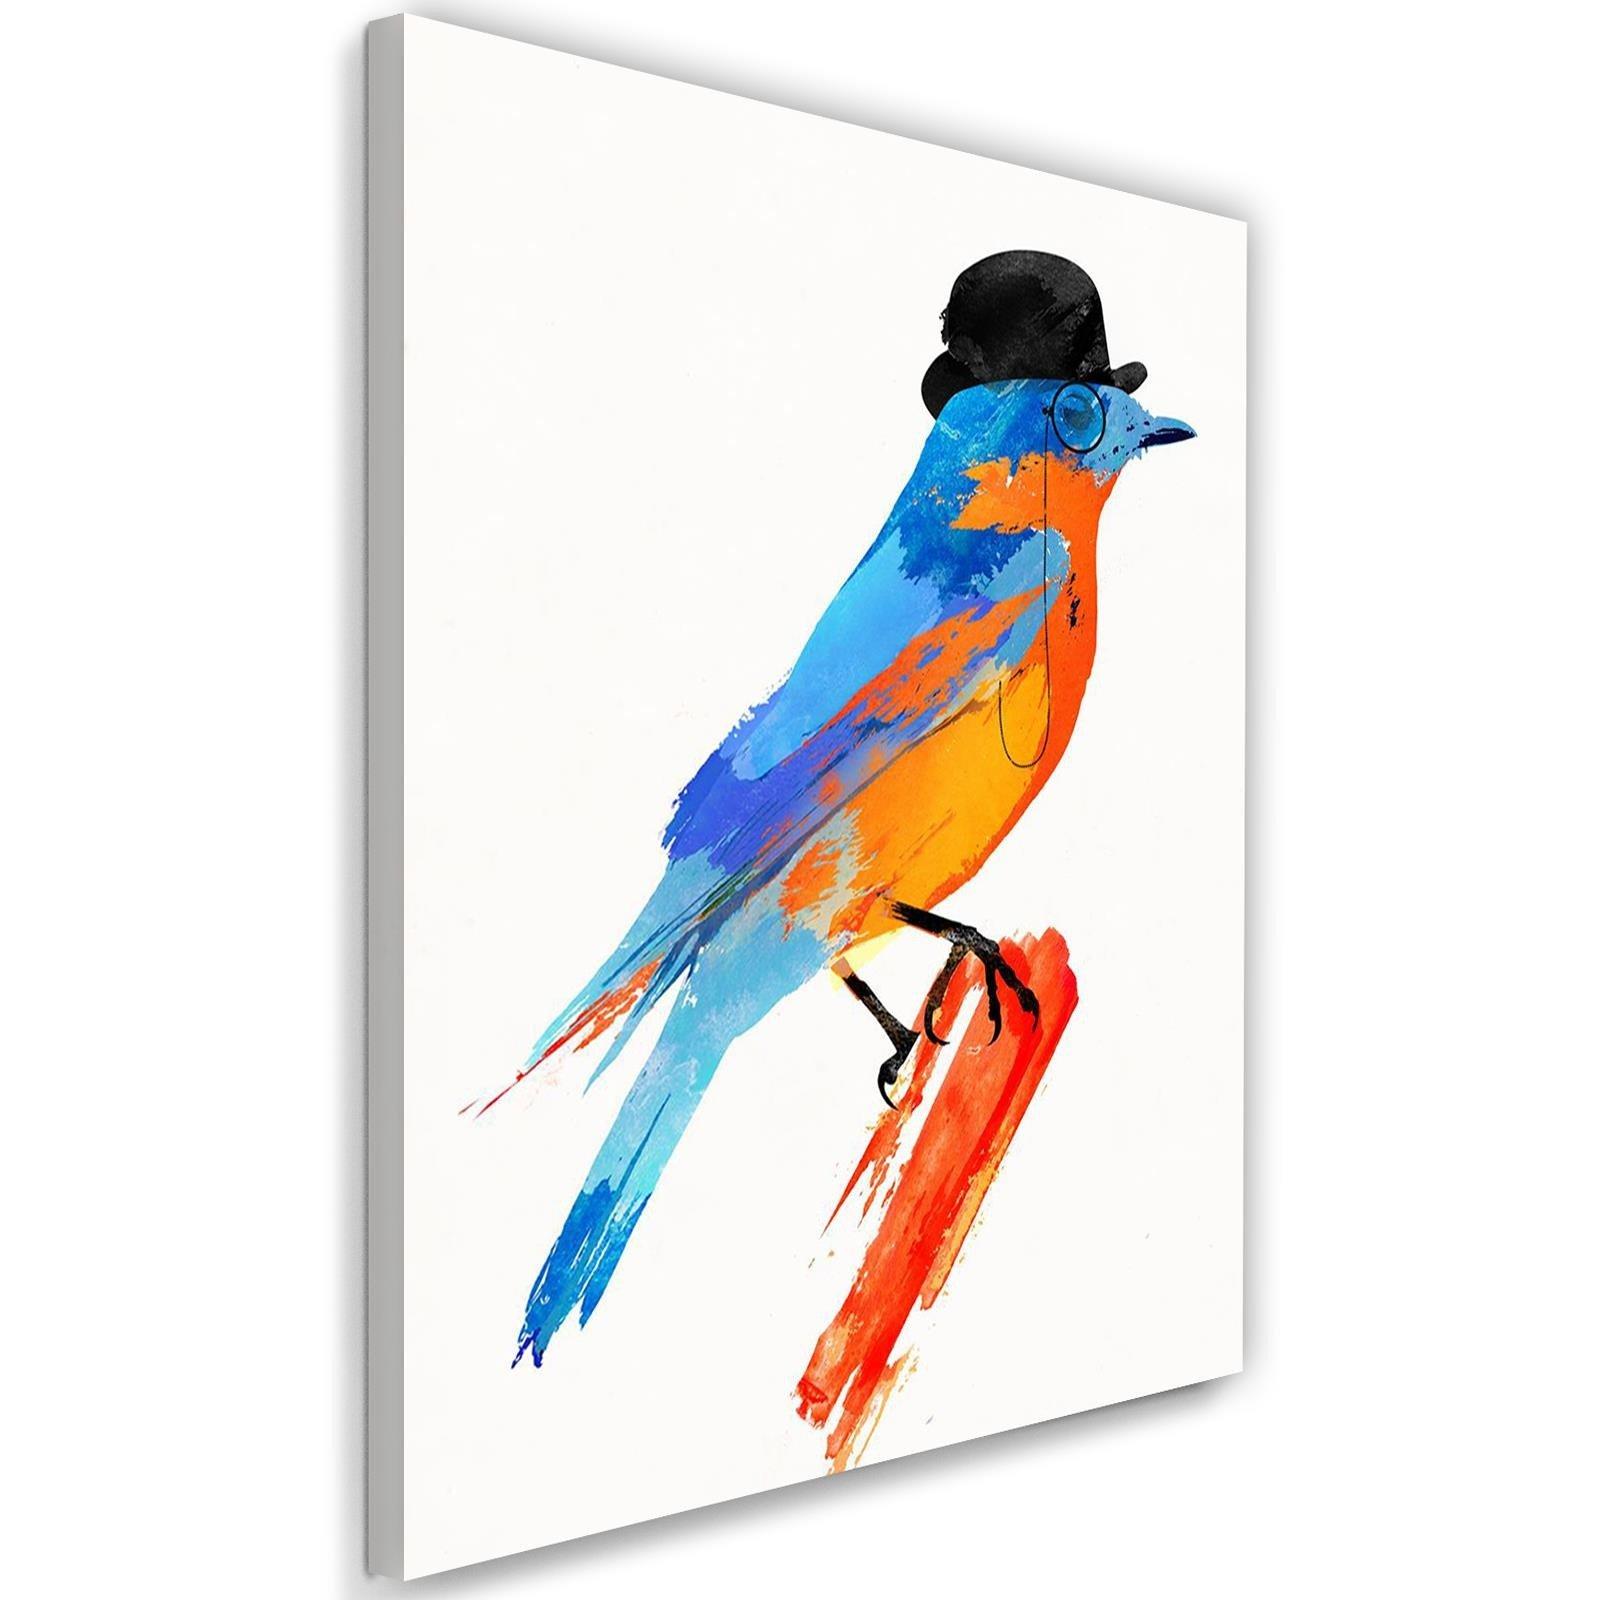 Tableau enfant bird in a bowler hat orange 70x100